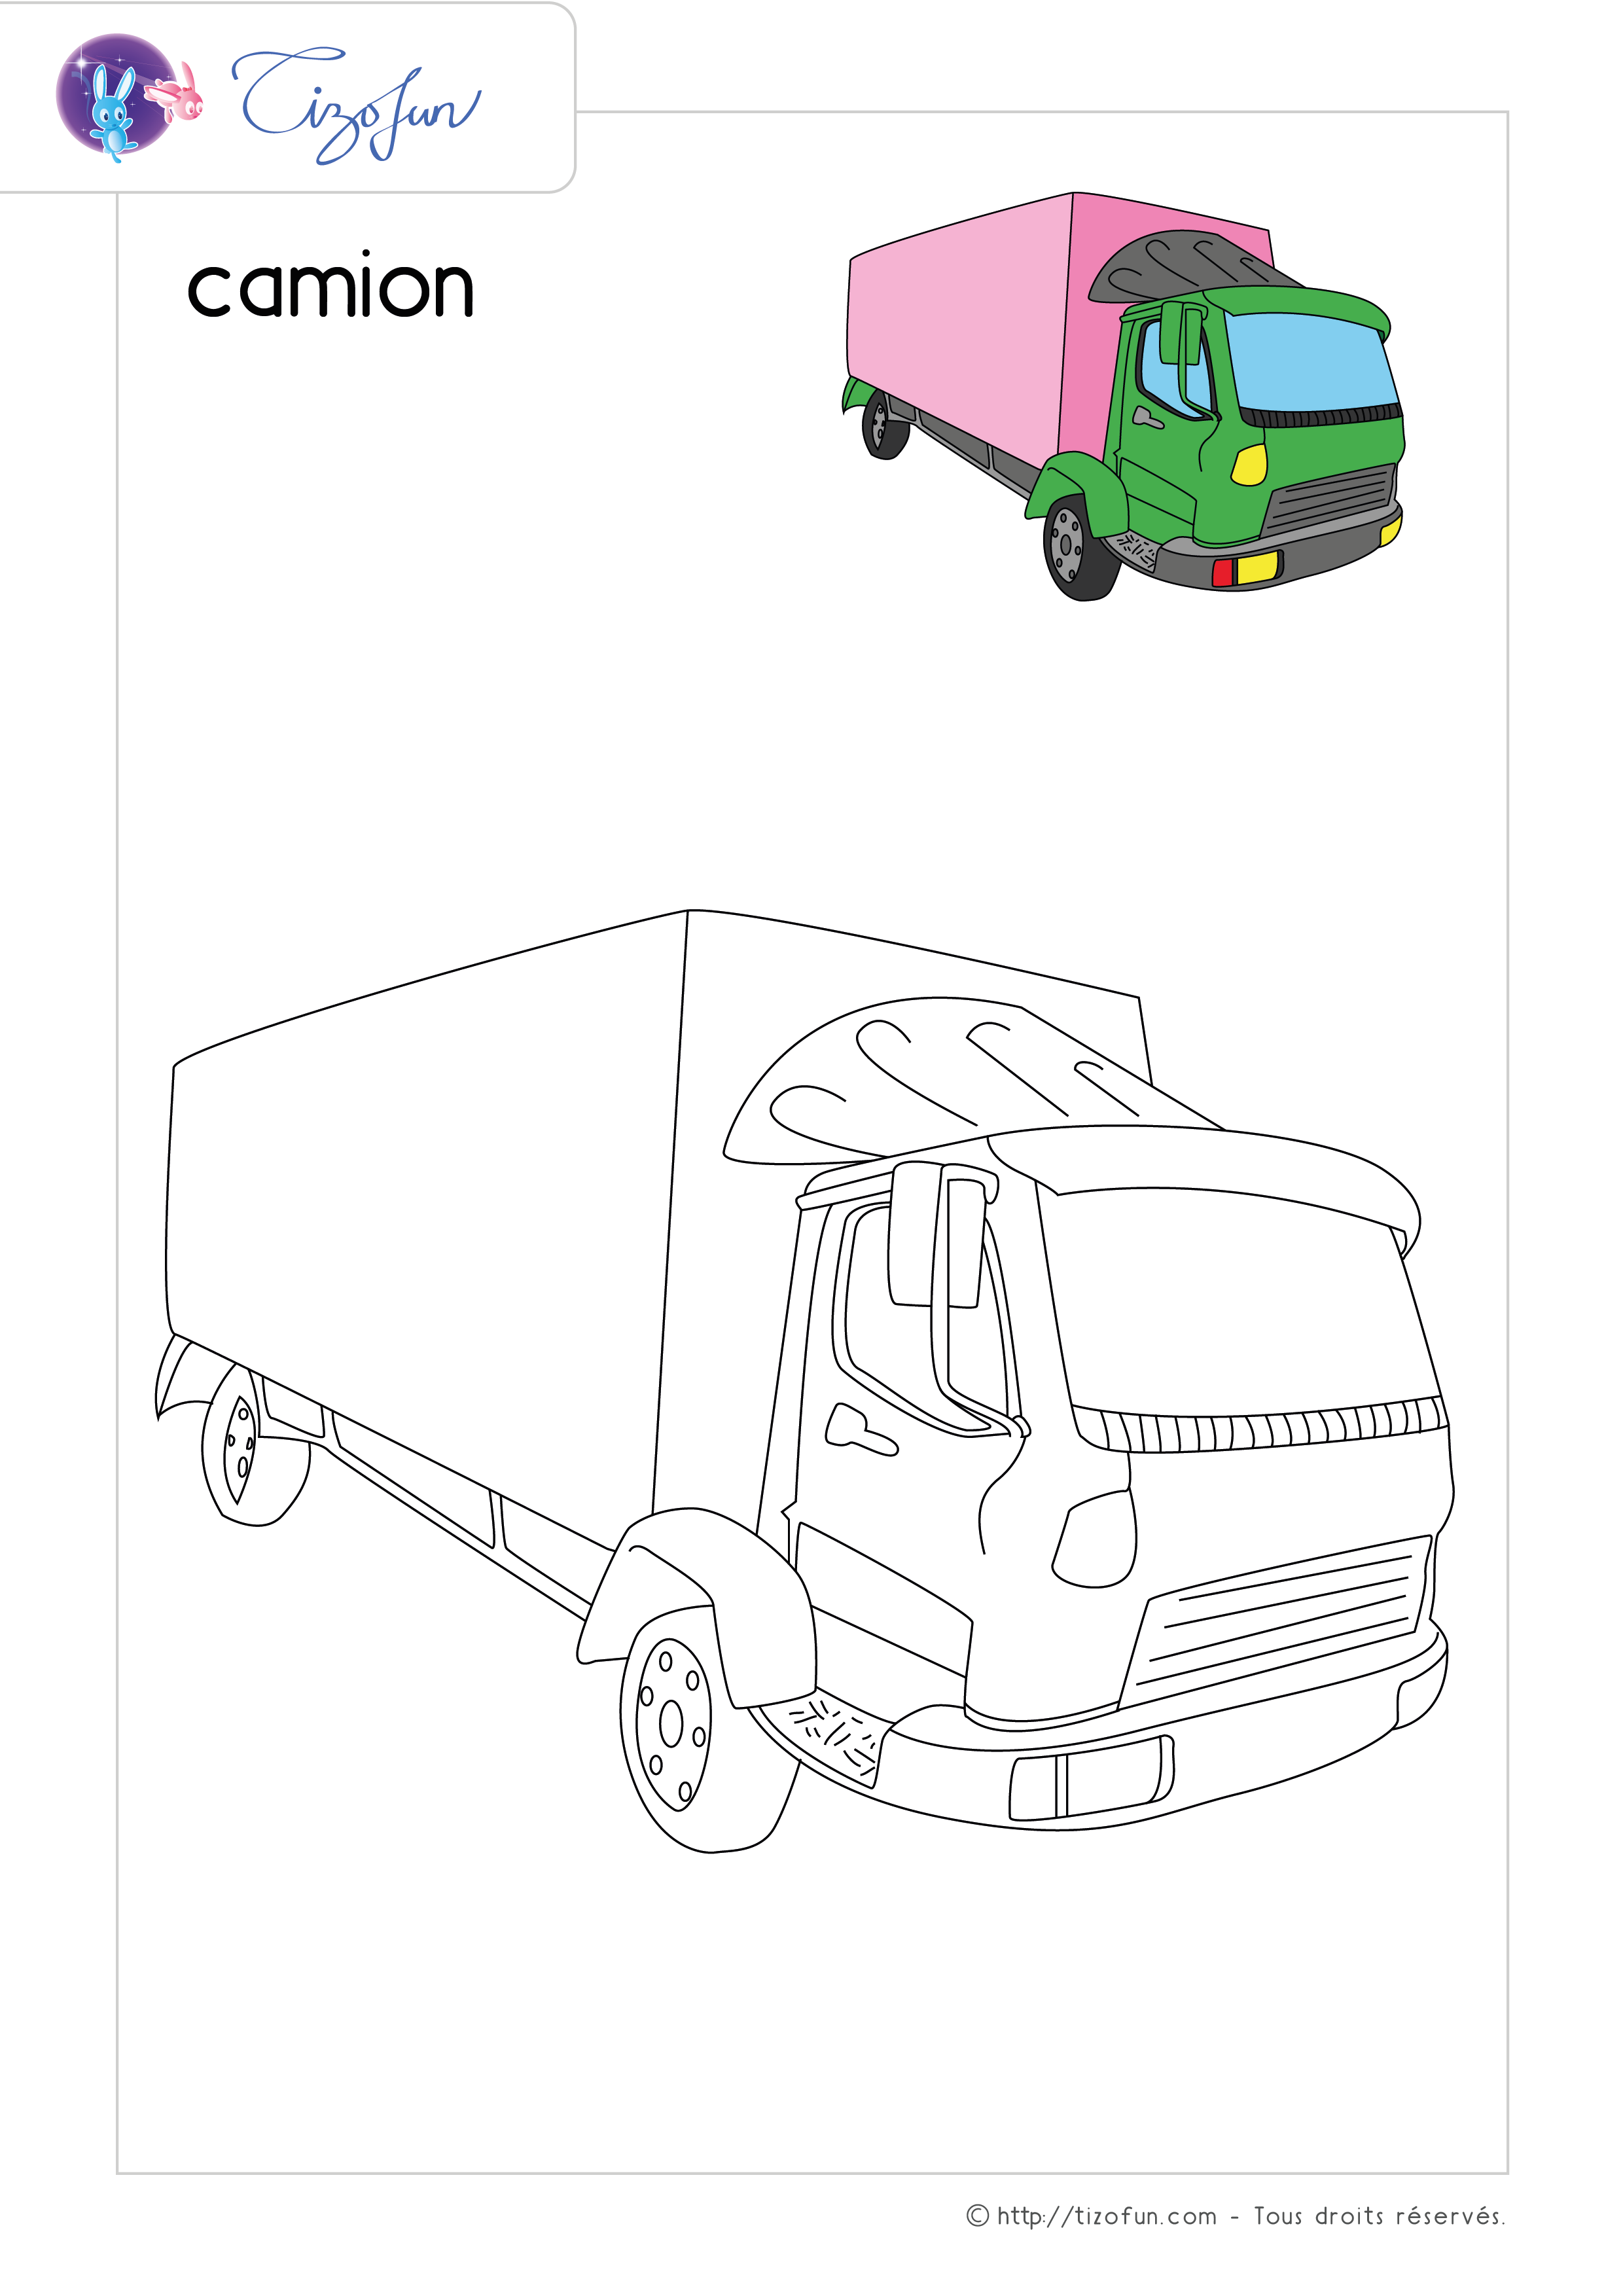 Coloriage Transport Dessin Camion Ovi Közlekedés Dessin